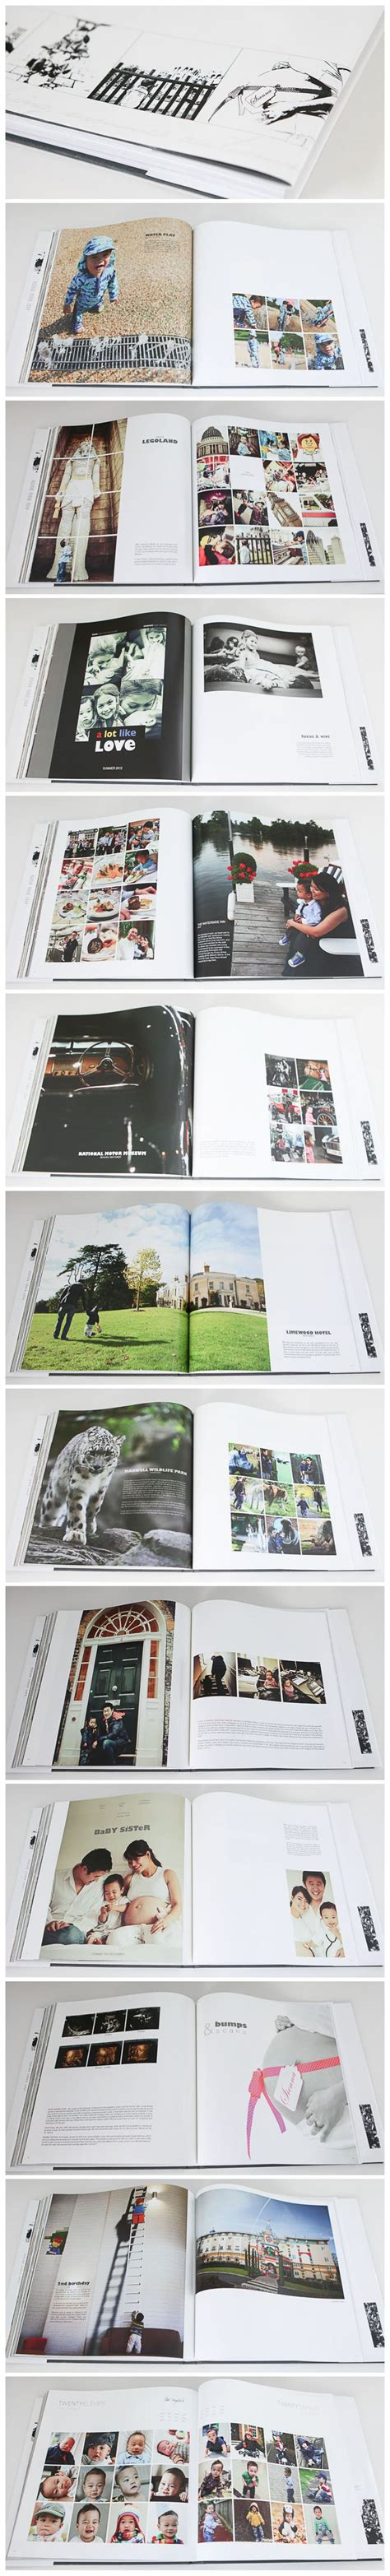 layout book online 576 best photobook ideas images on pinterest